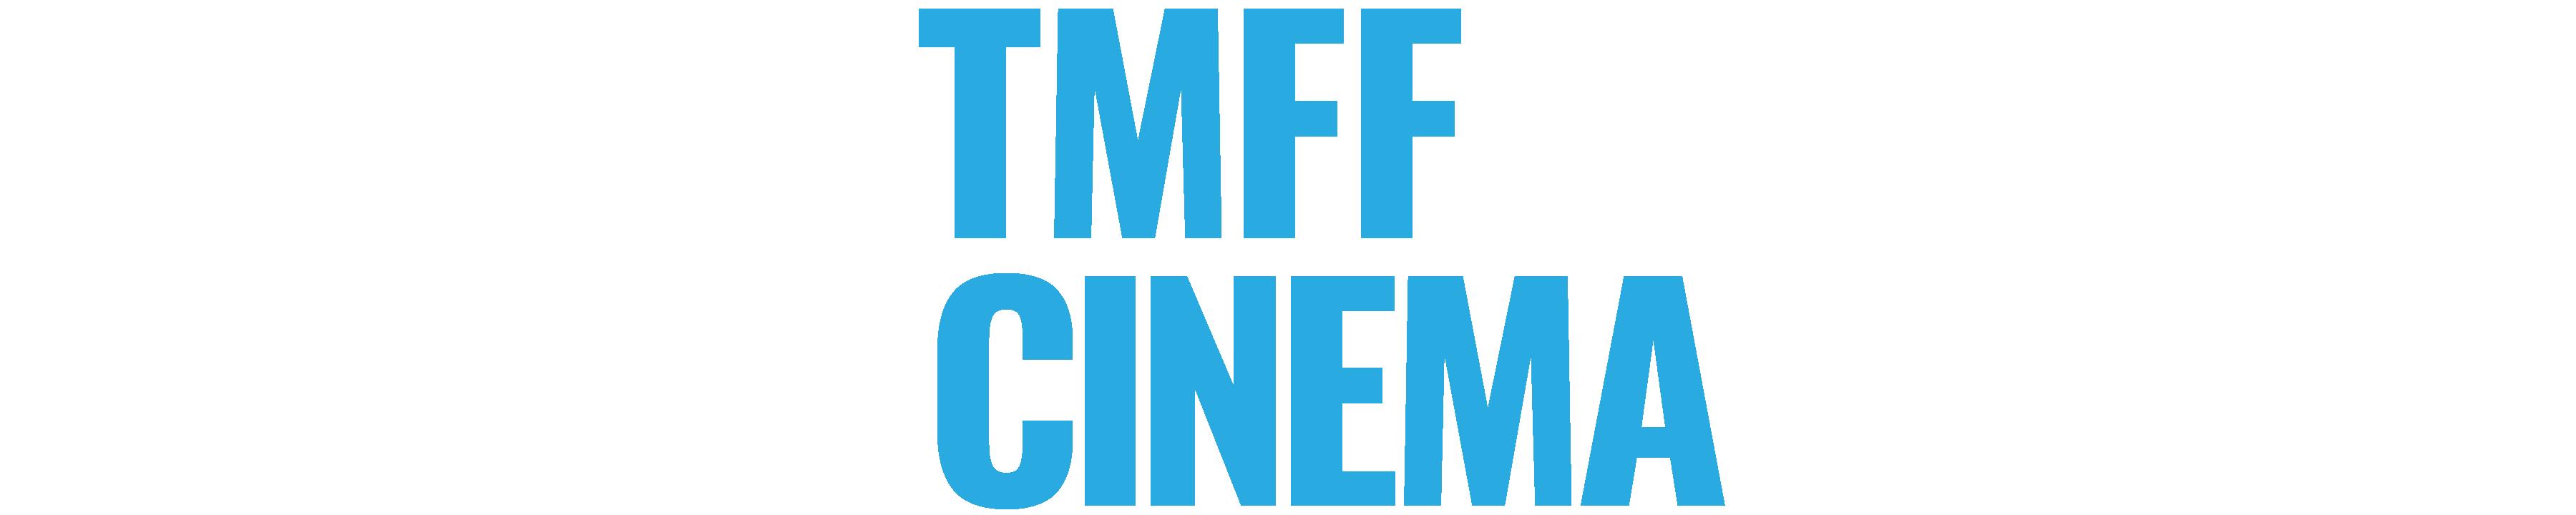 TMFF Cinema